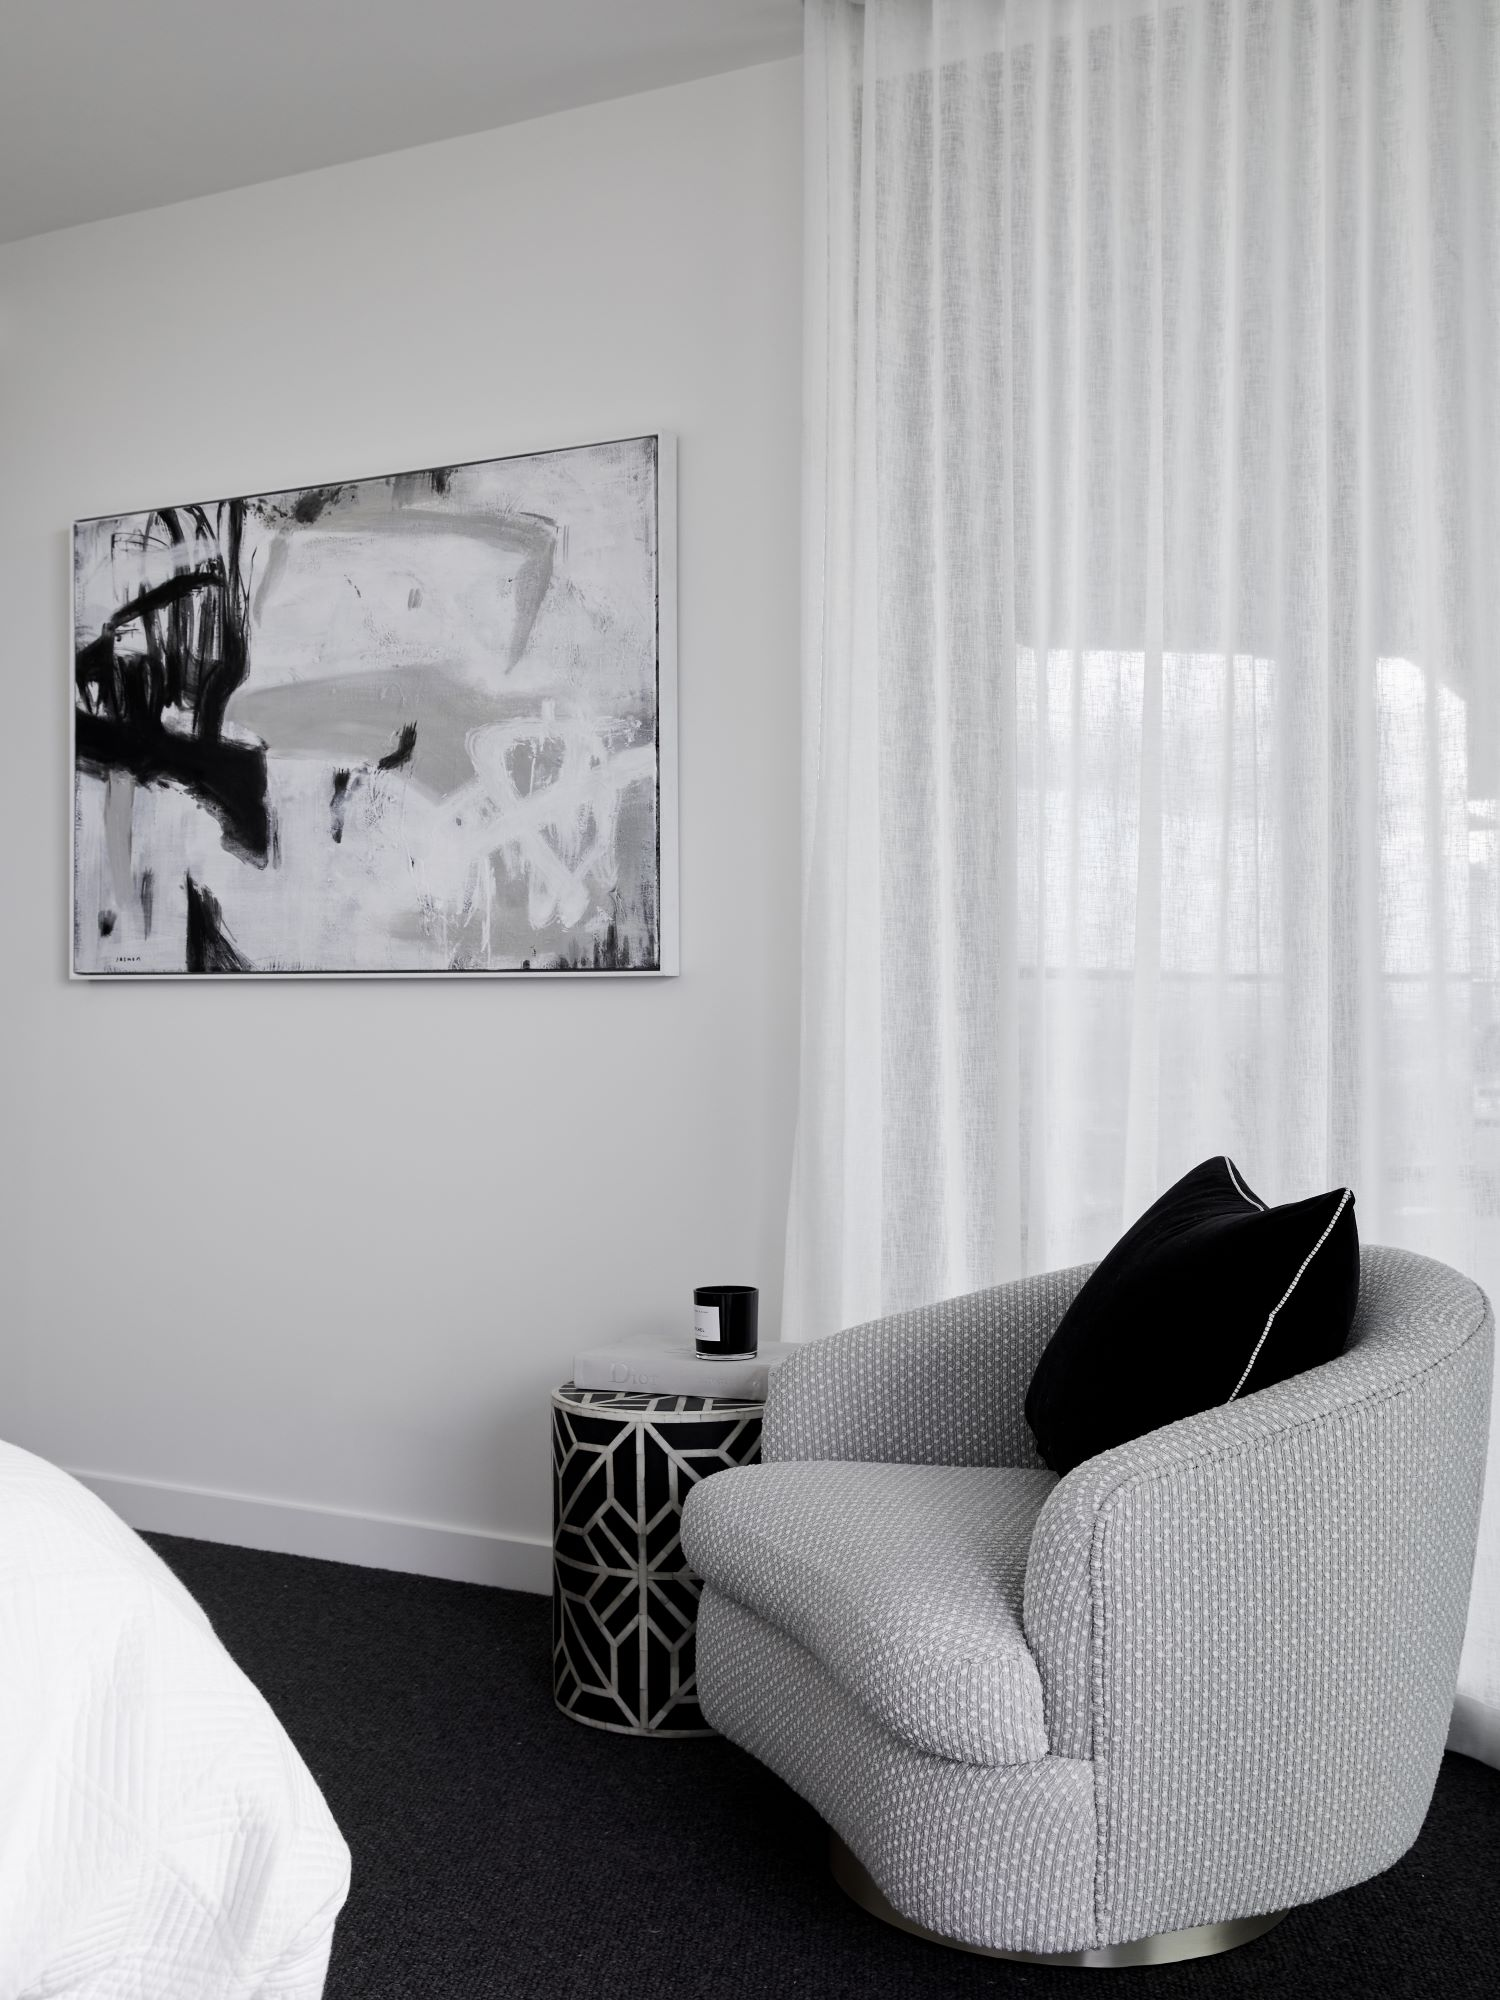 raydan-blair-interior-design-styling-bedroom-armchair